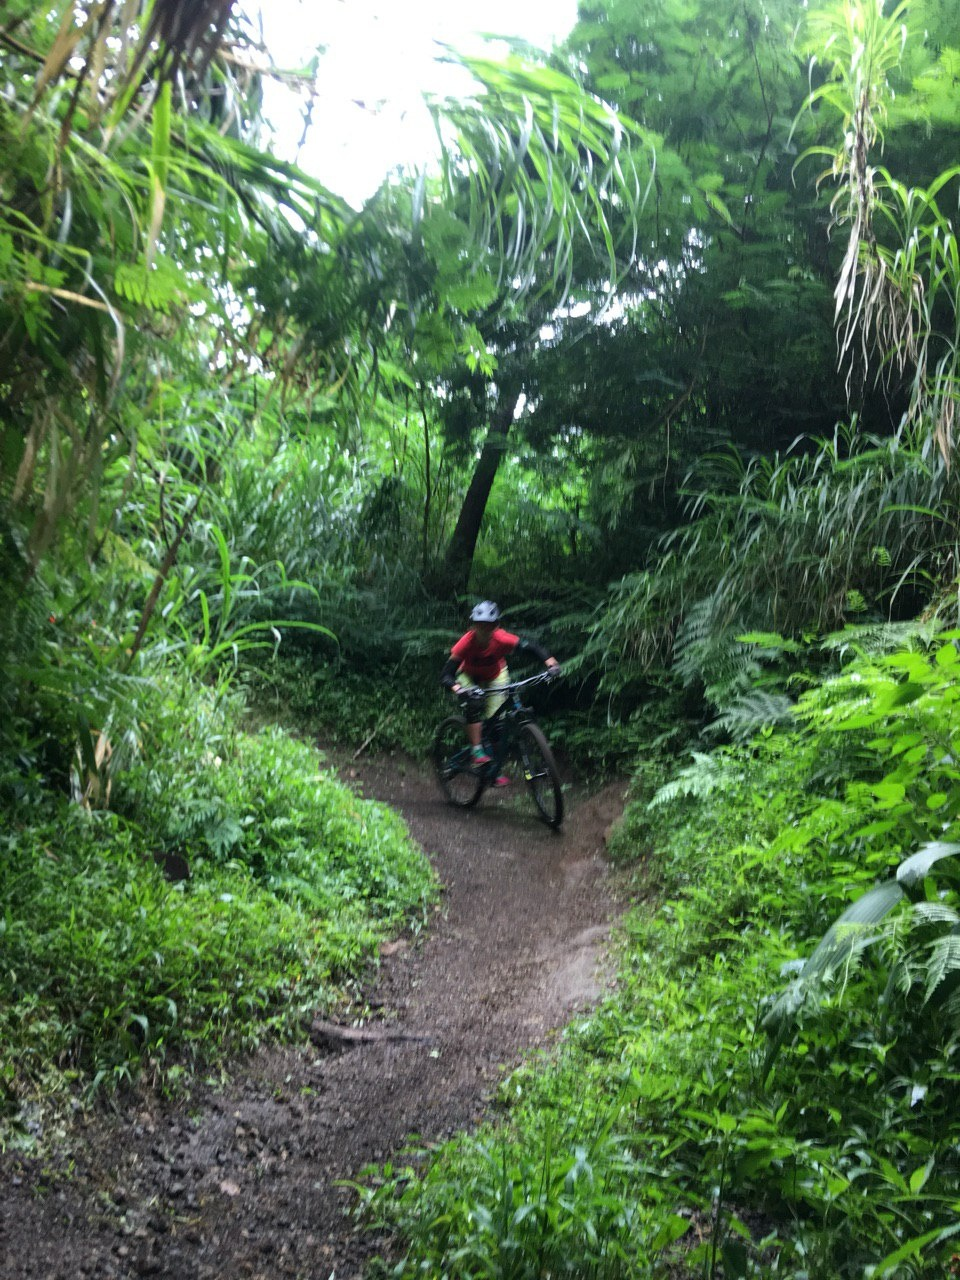 Блог им. CrazzyKat: Маунтинбайк на Бали вместо серфинга!